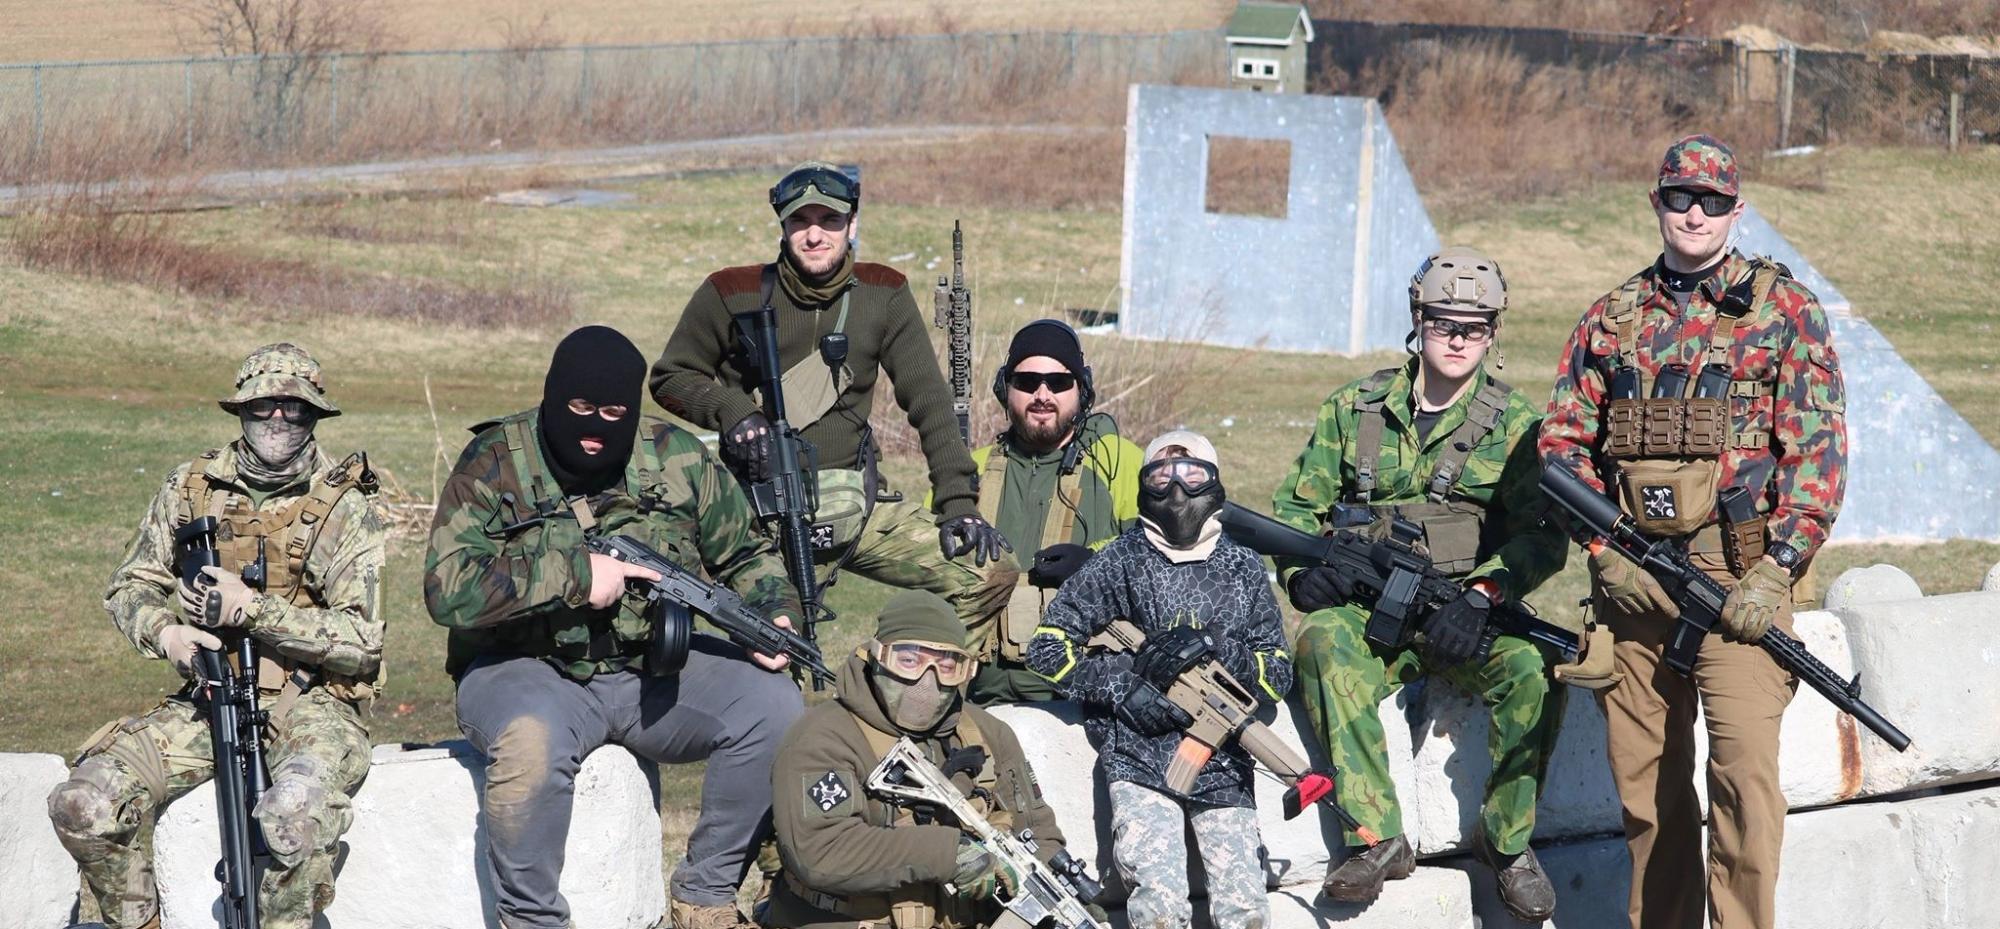 Task Force Anvil - Long Island Milsim Group